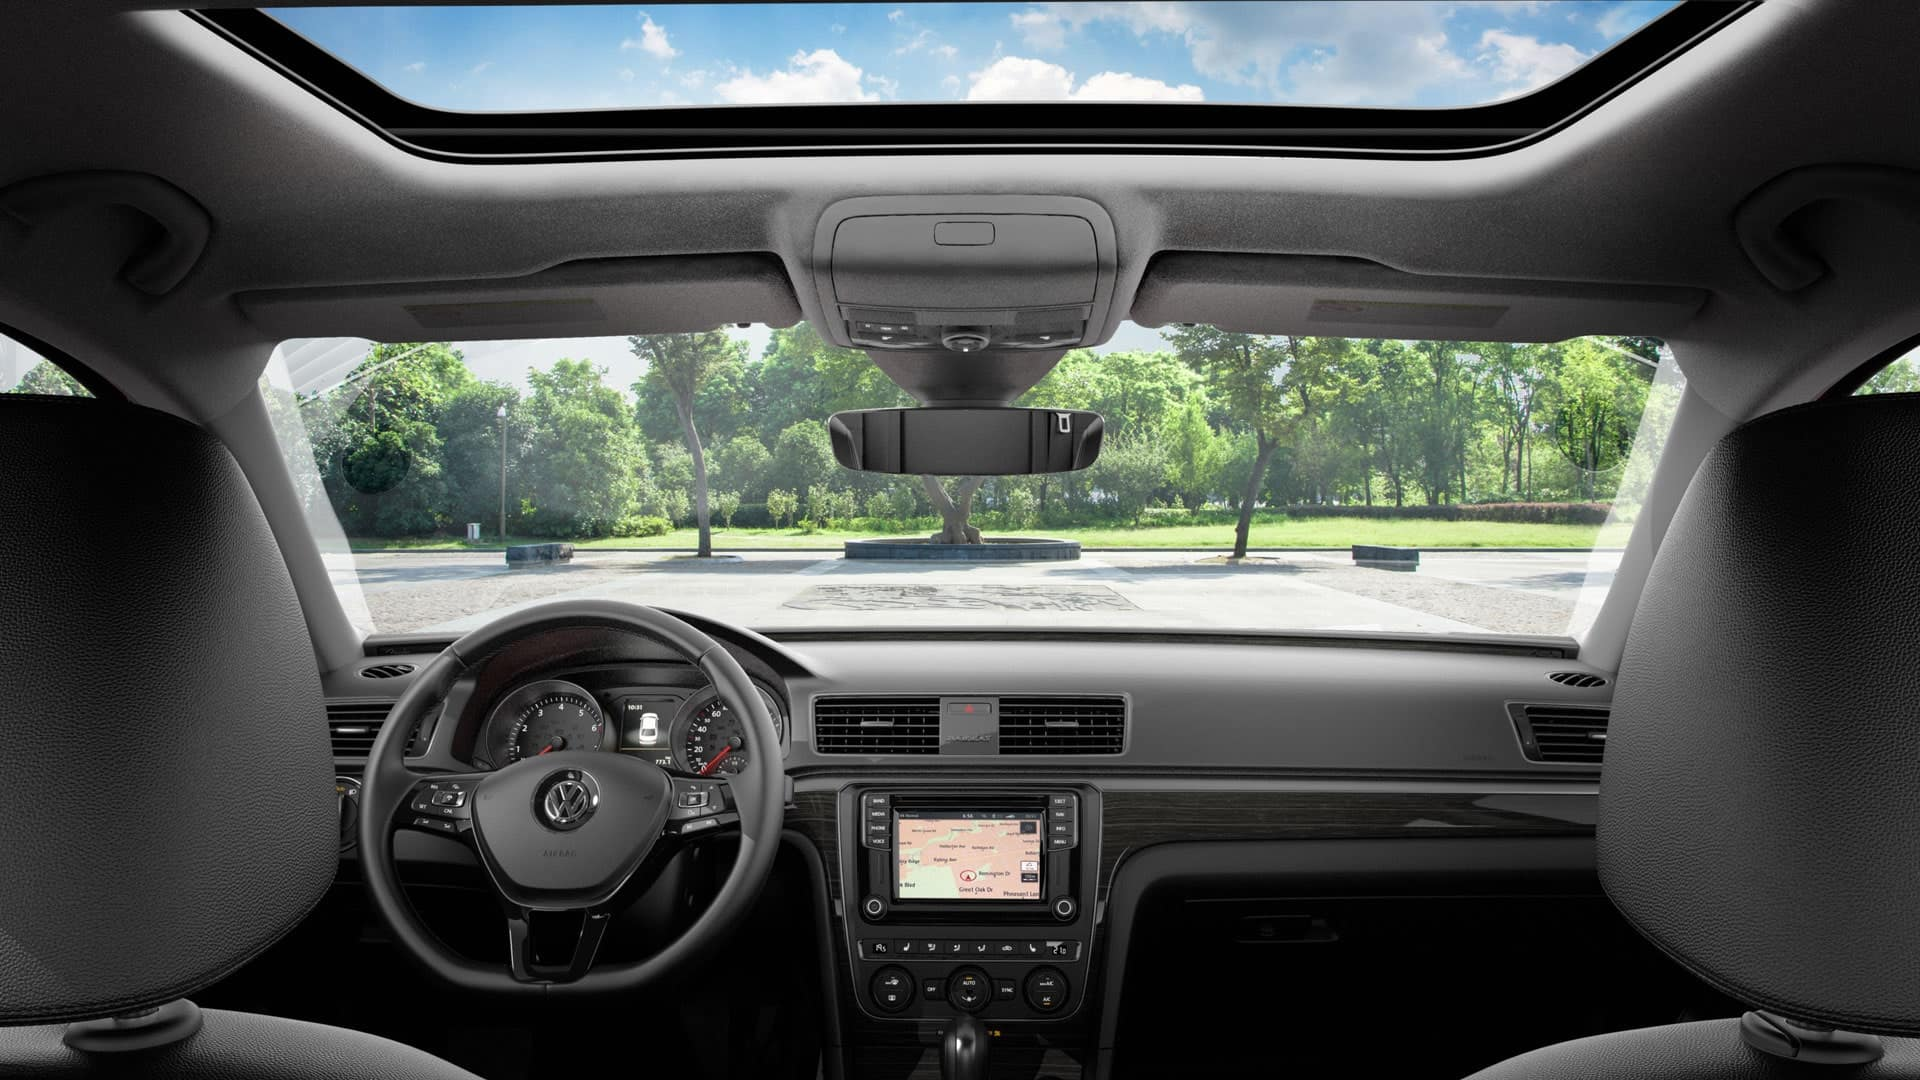 2019 VW Passat sunroof and navigation